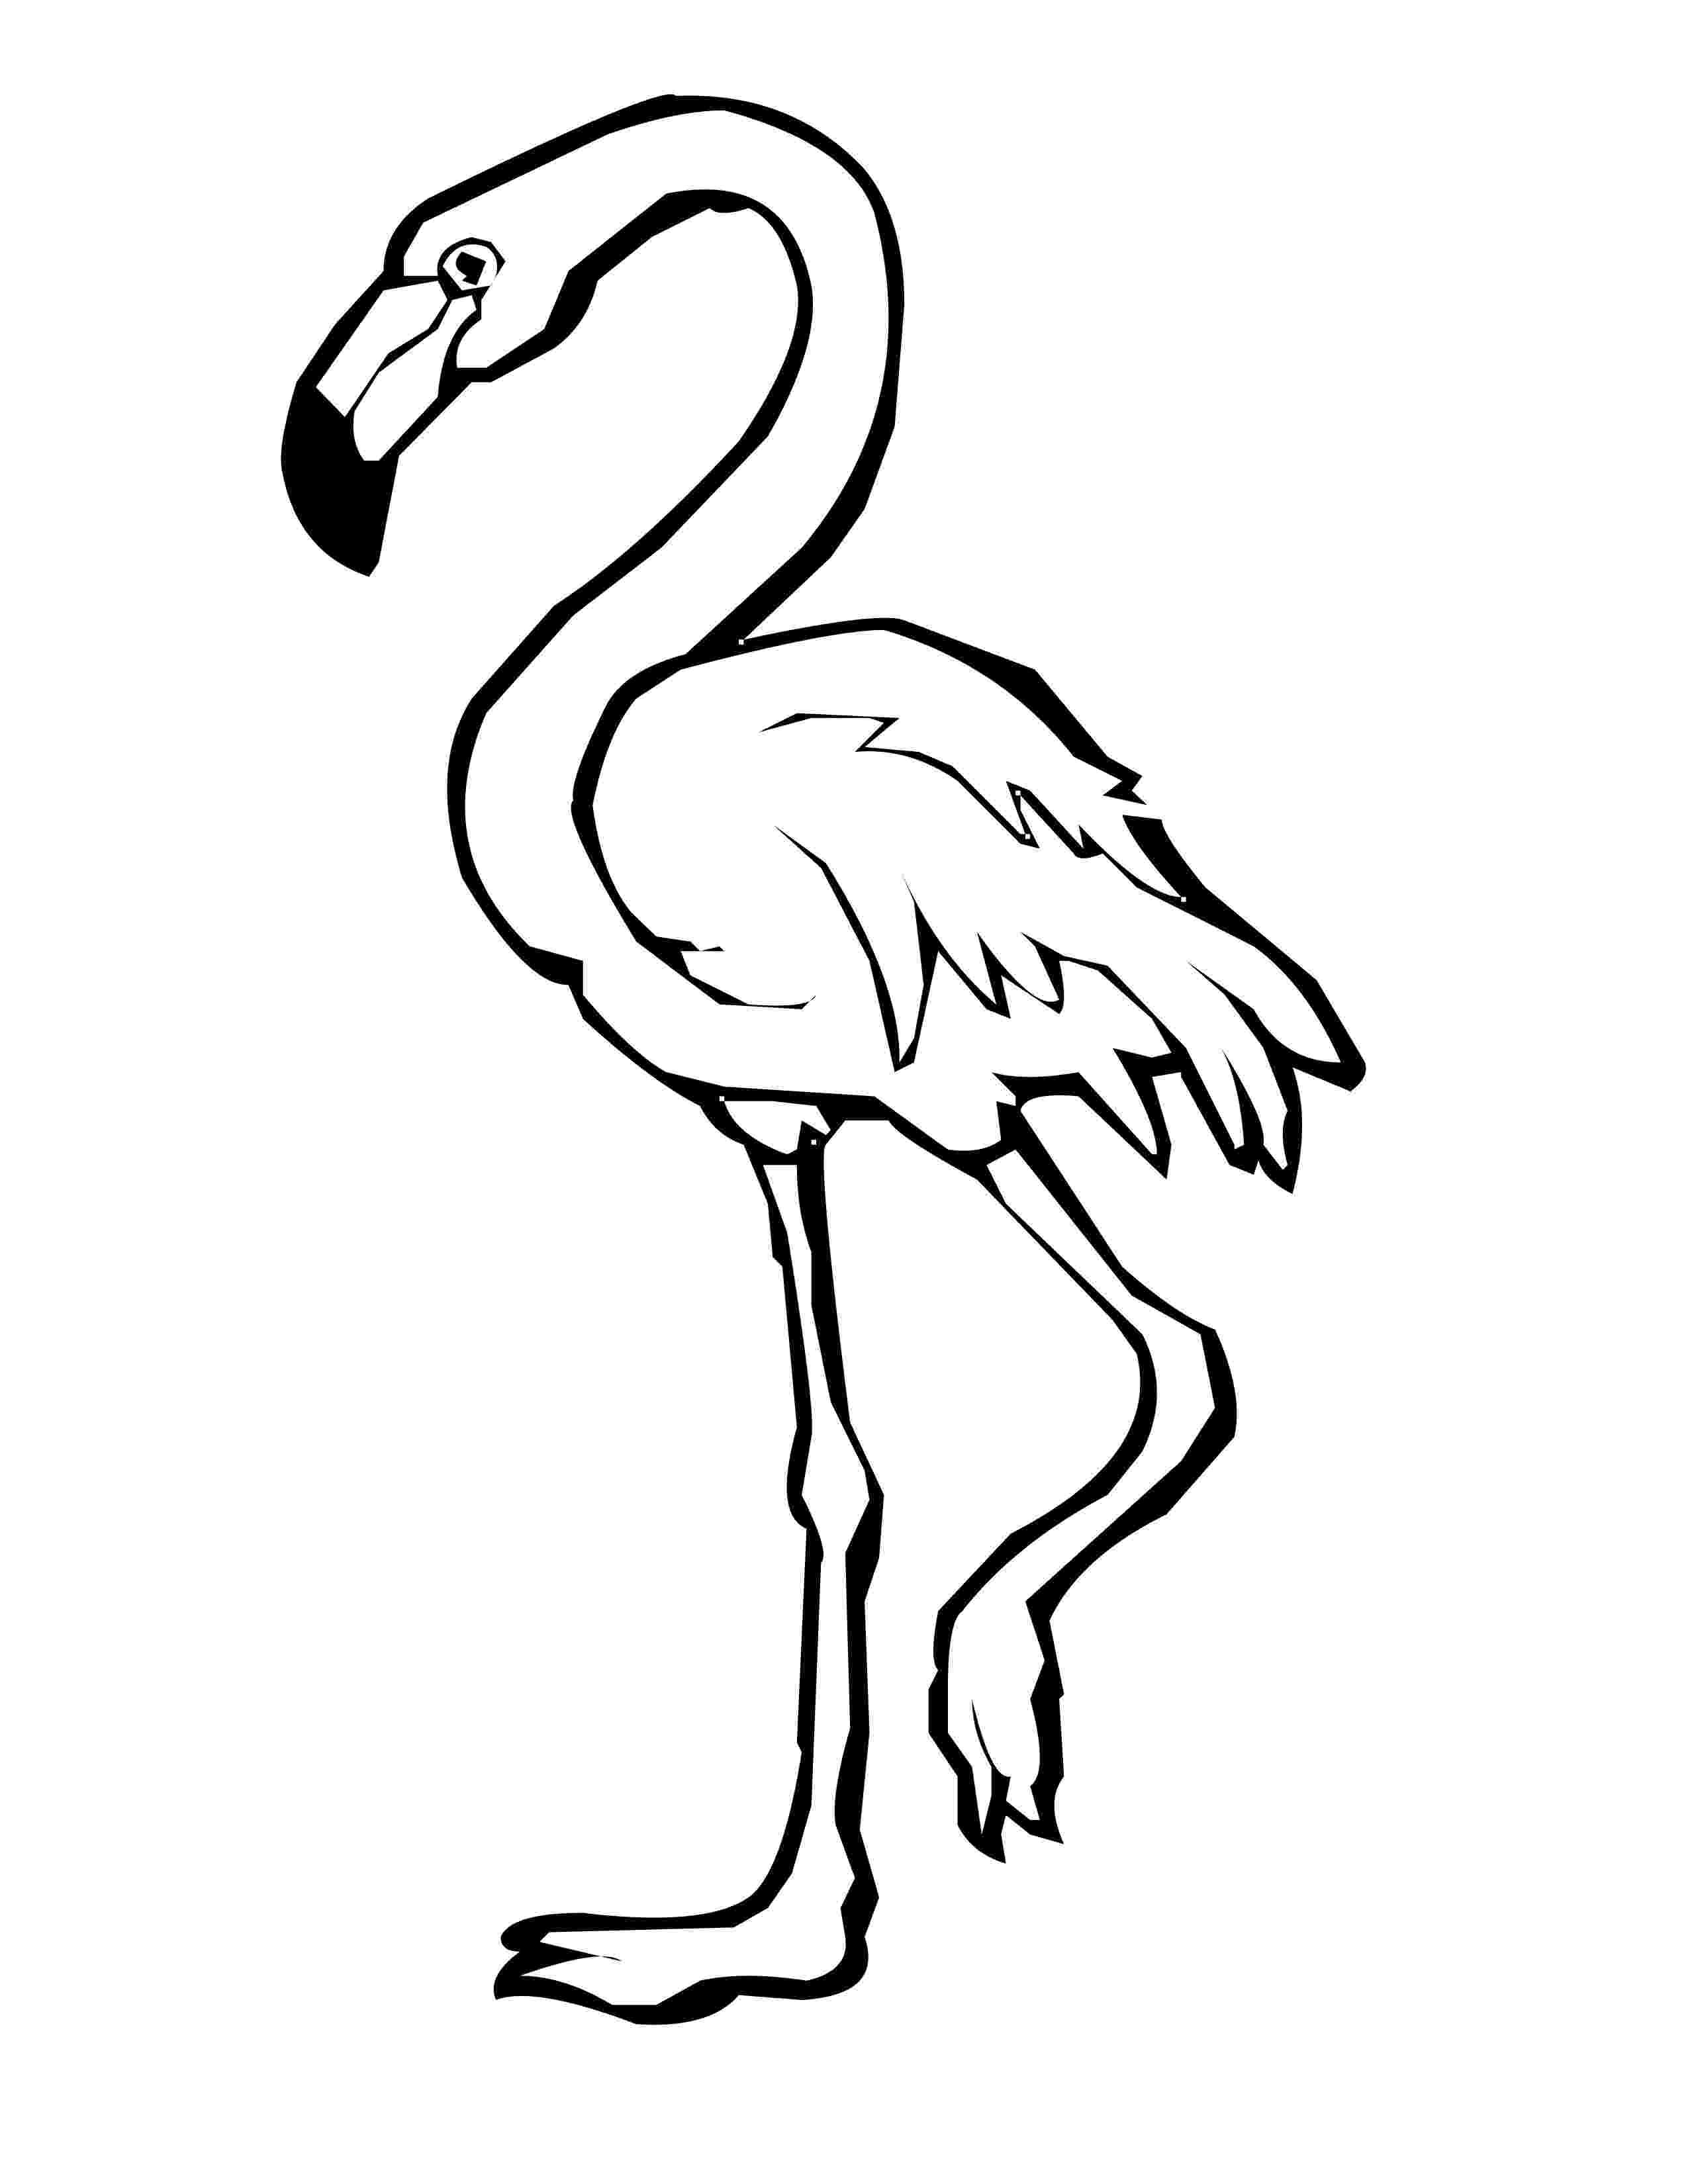 flamingo coloring sheet flamingos coloring pages to kids sheet flamingo coloring